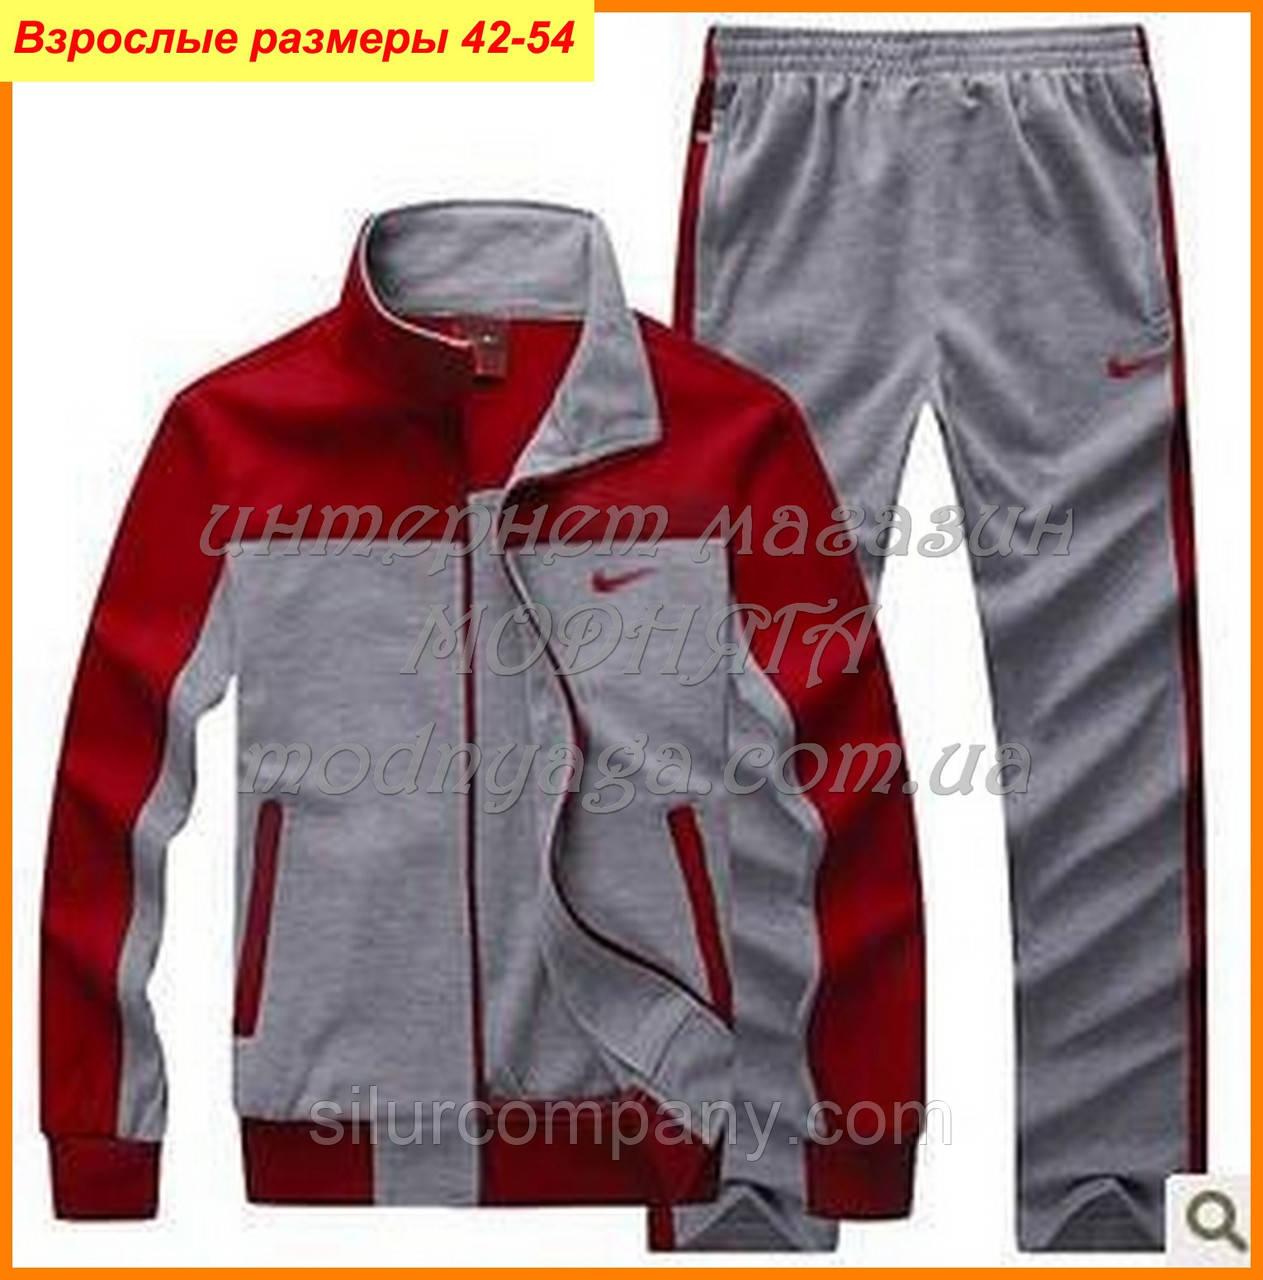 001bbe94e93f Спортивний костюм найк   nike одежда - Интернет магазин